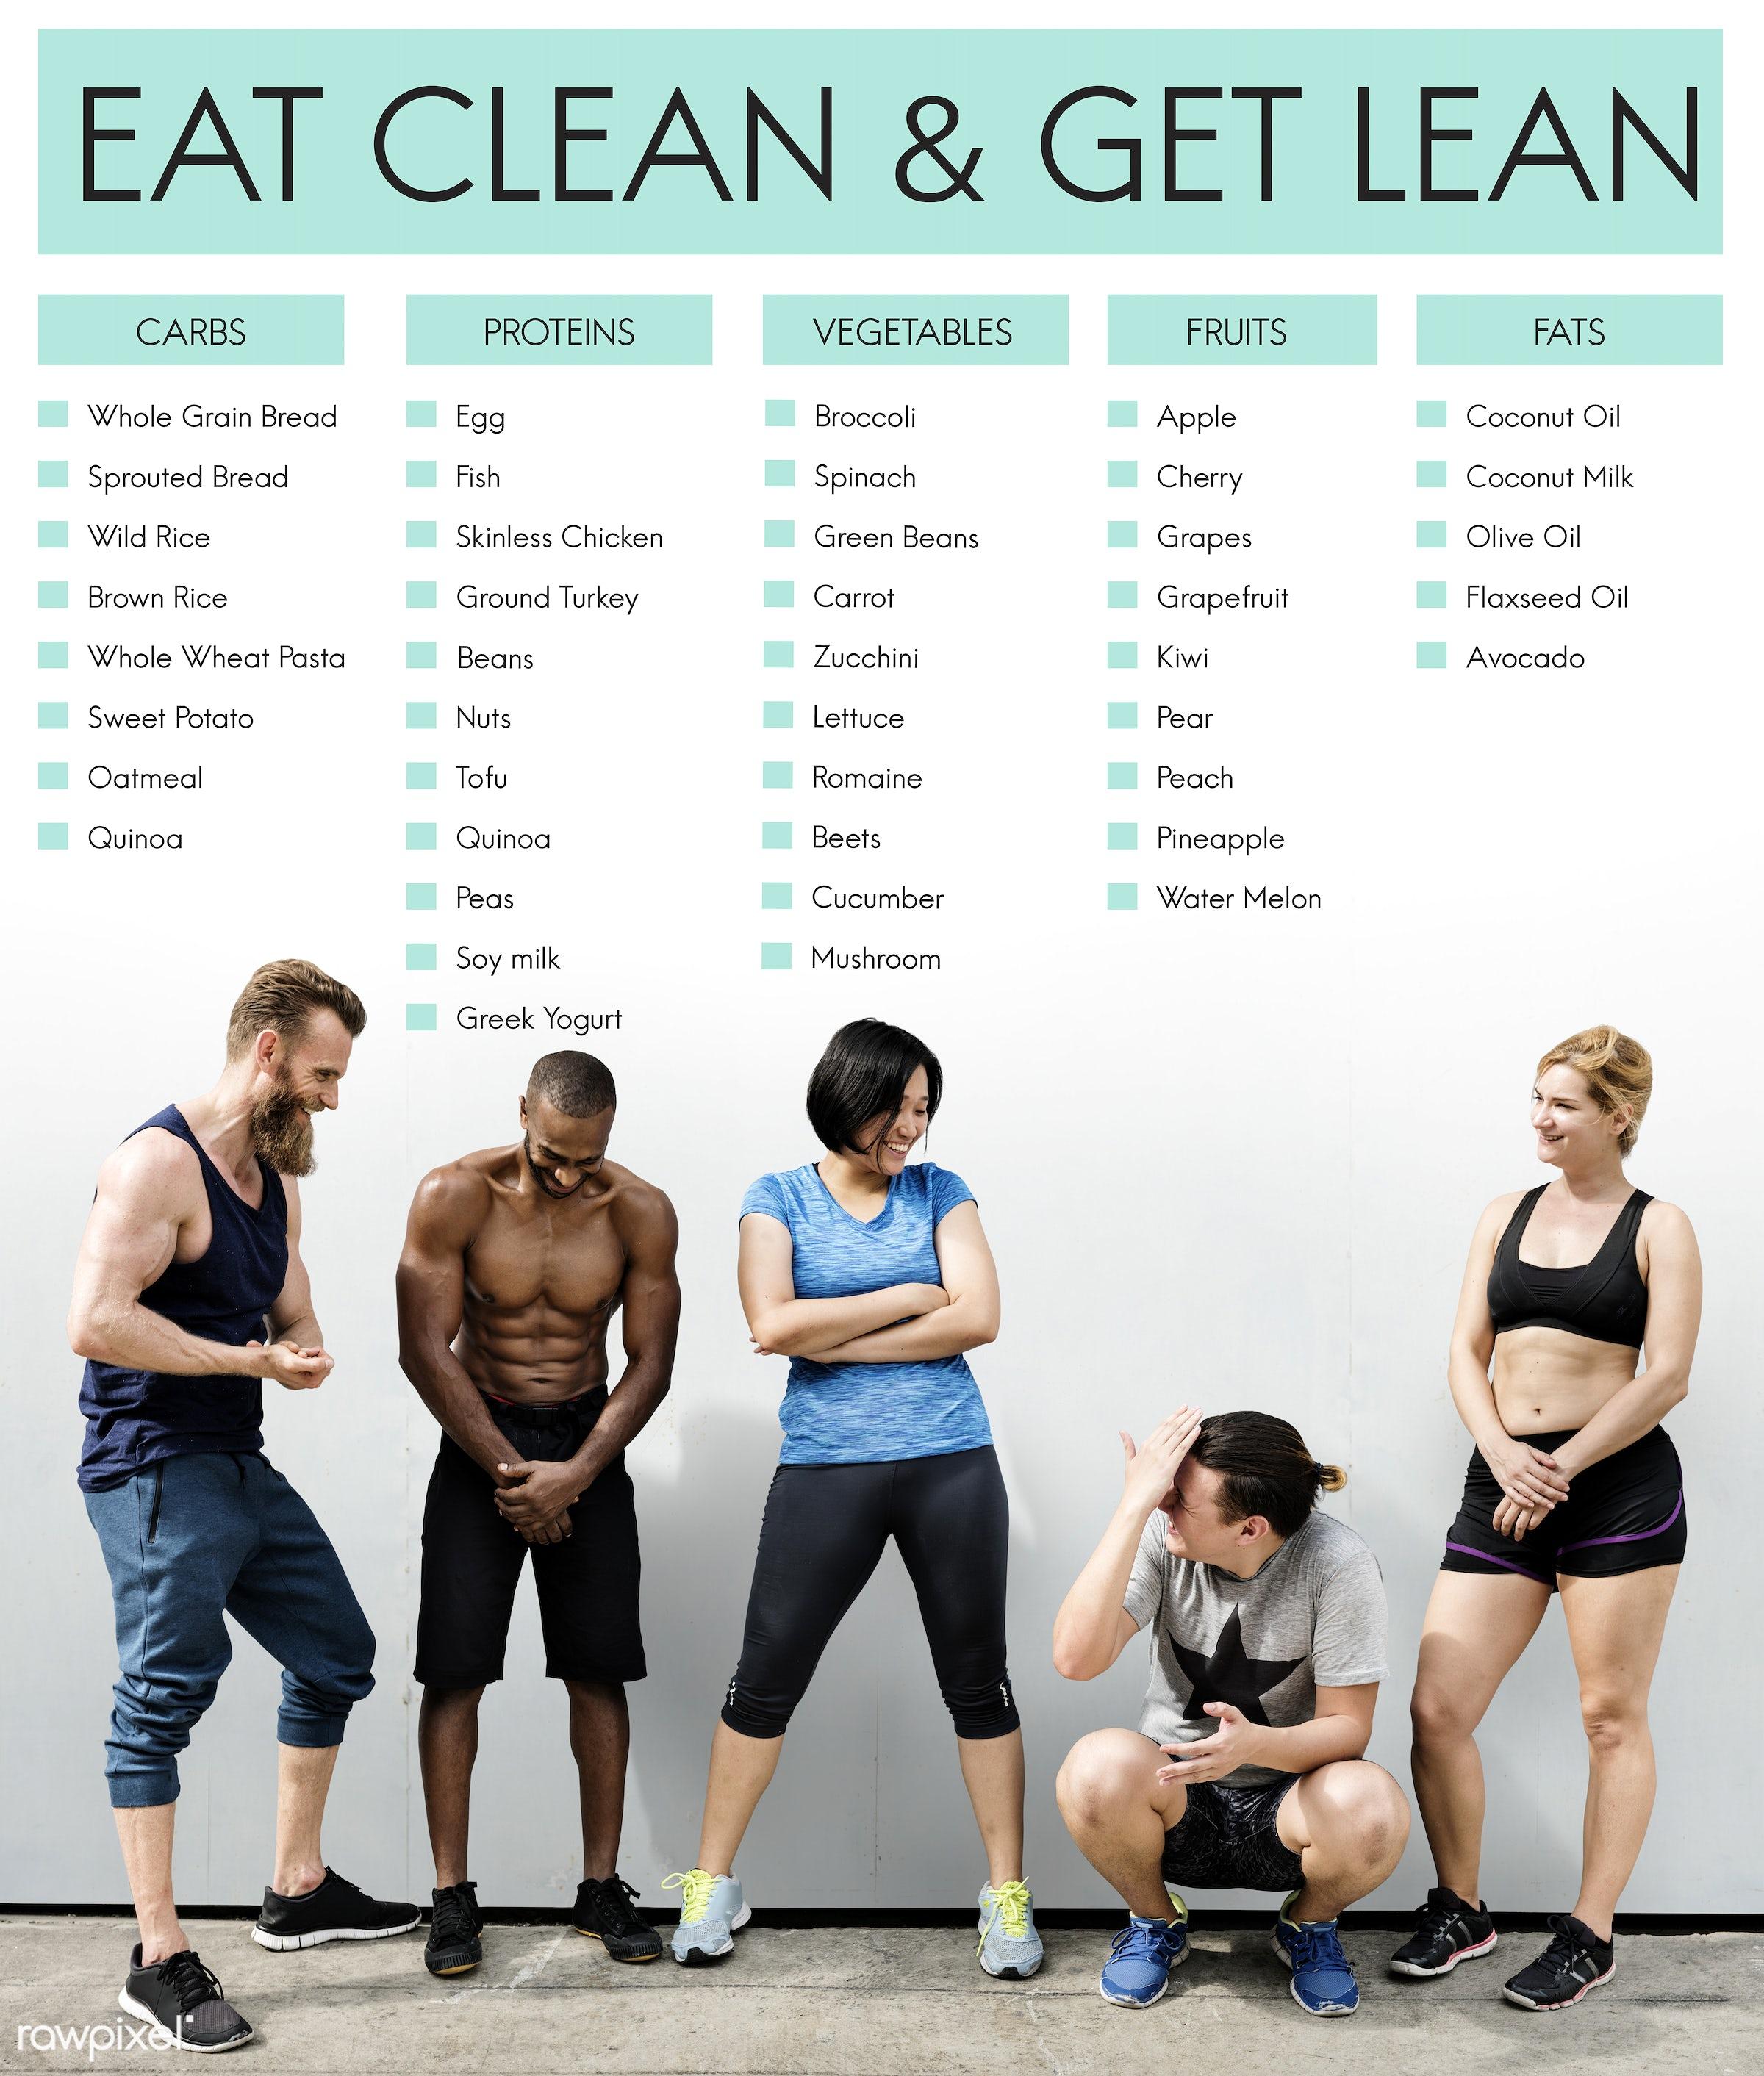 african descent, asian, be fit, caucasian, clean, diet, dietary, diversity, eat, eat clean, enjoy, exercise, female, fit,...